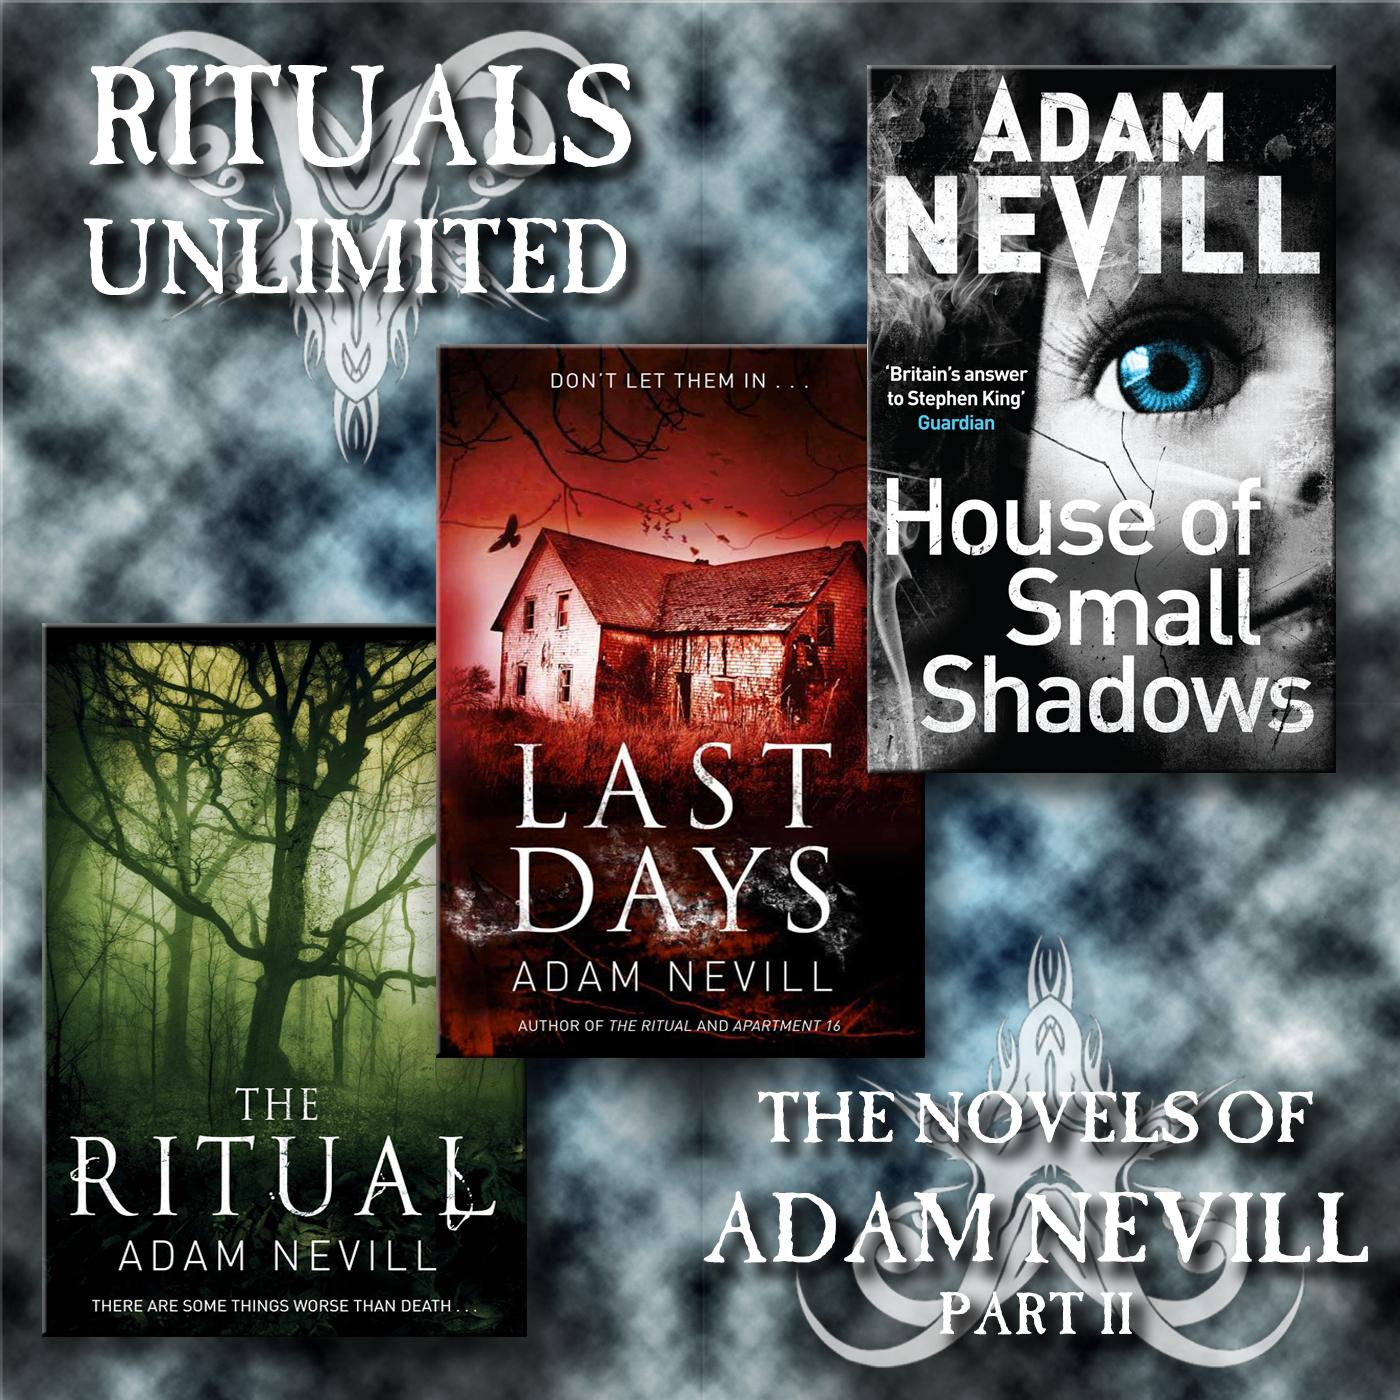 HYPNOGORIA 96 - Rituals Unlimited: The Novels of Adam Nevill Part II